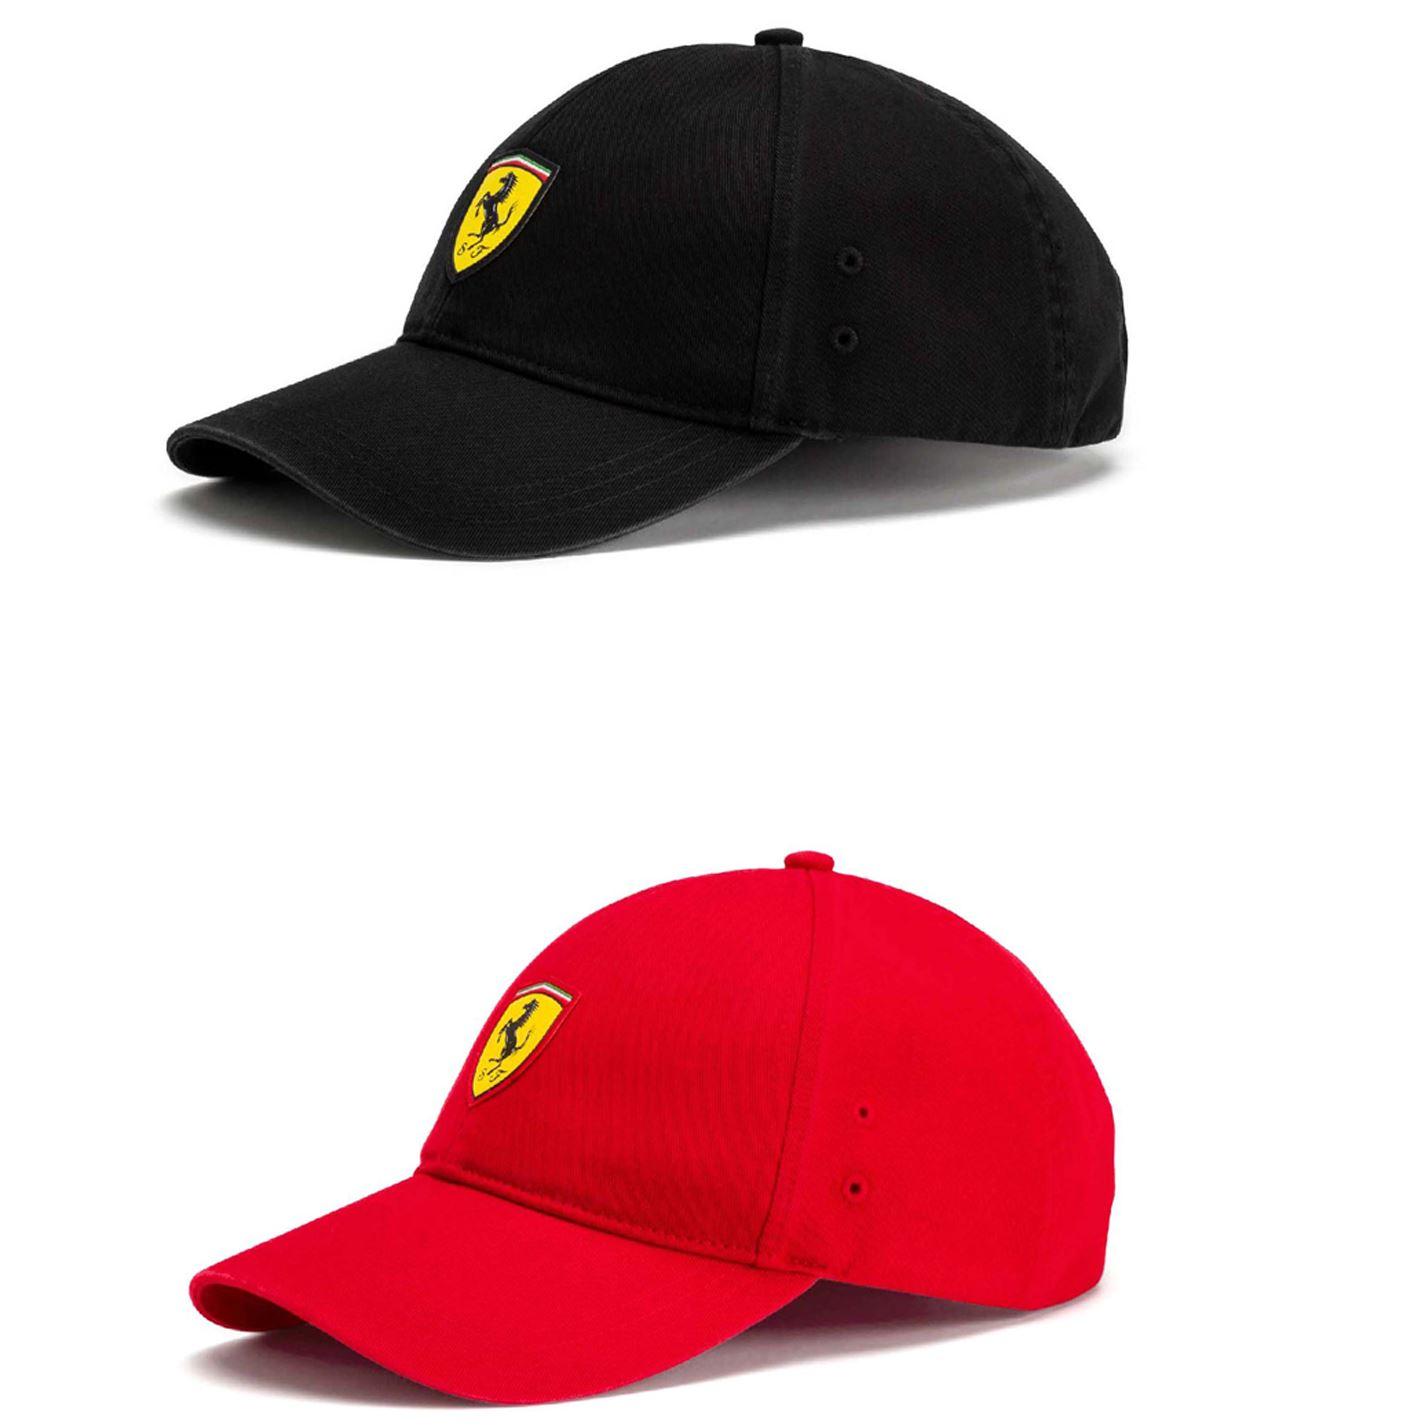 Details about Puma Ferrari Fanwear Baseball Cap Mens Baseball Hat Headwear